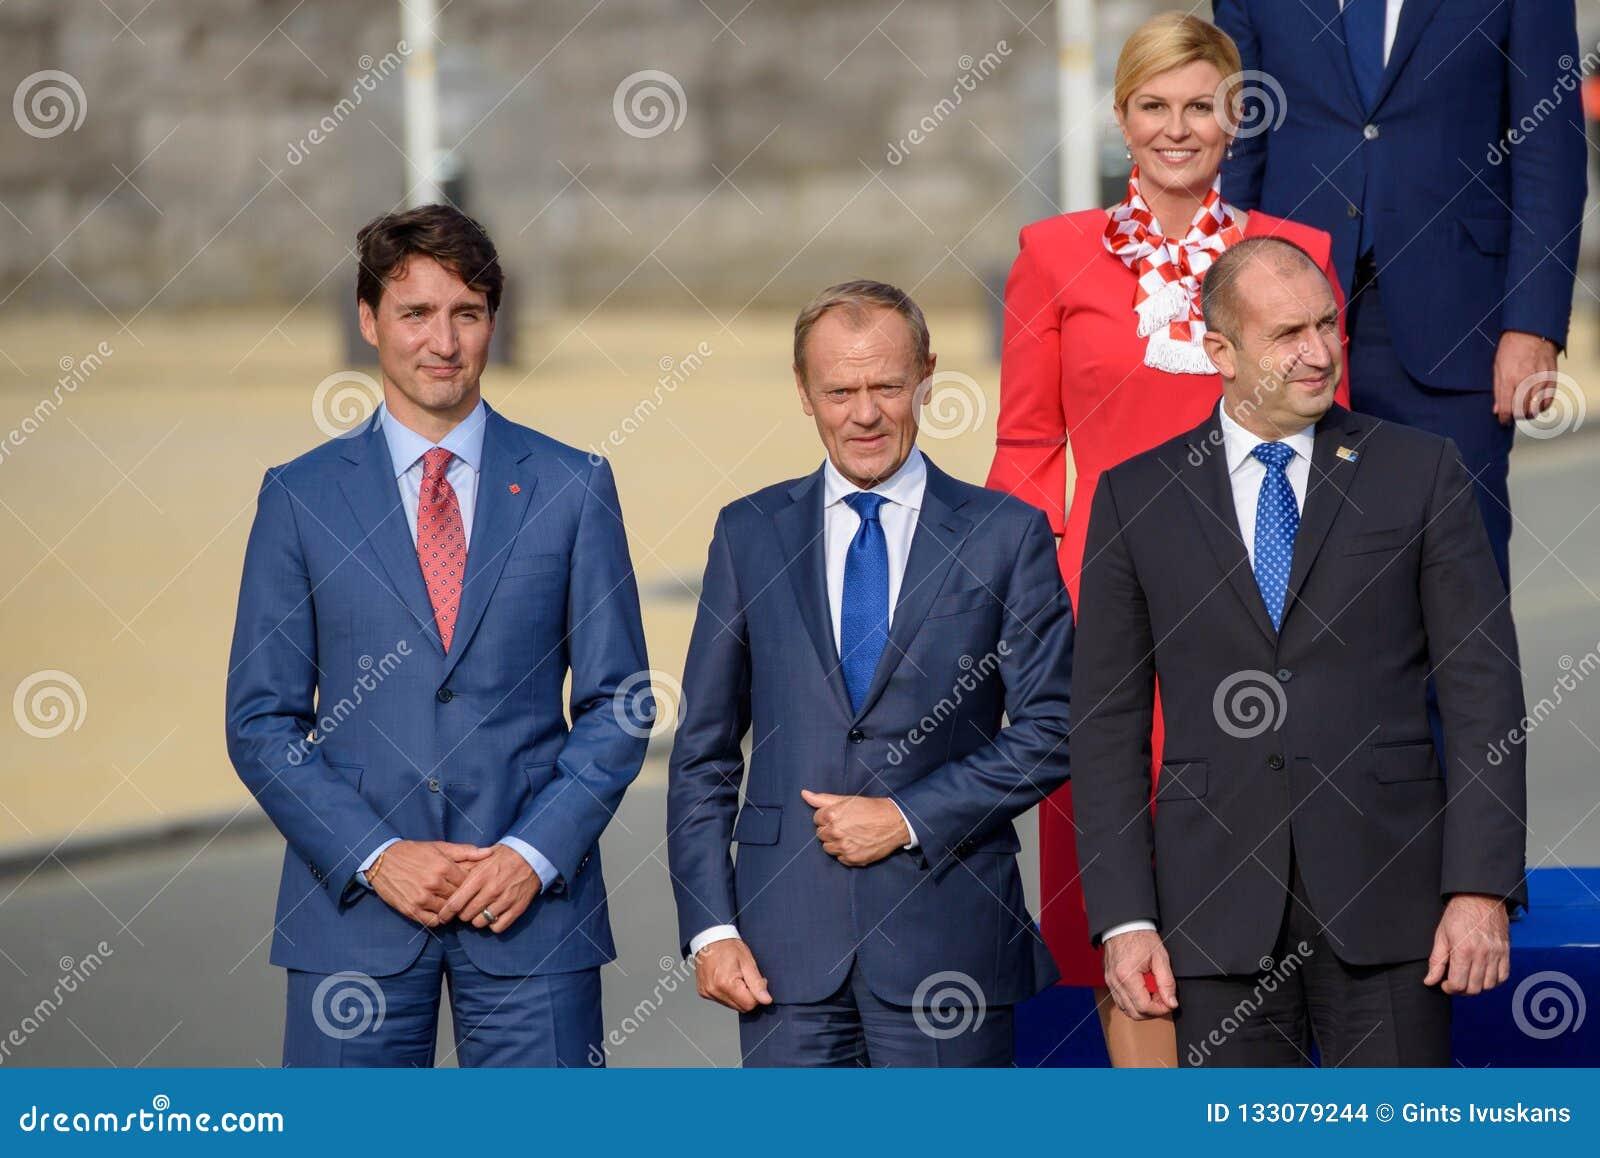 Justin Trudeau, Donald Tusk, Kolinda Grabar Kitarovic and Ruman Radev